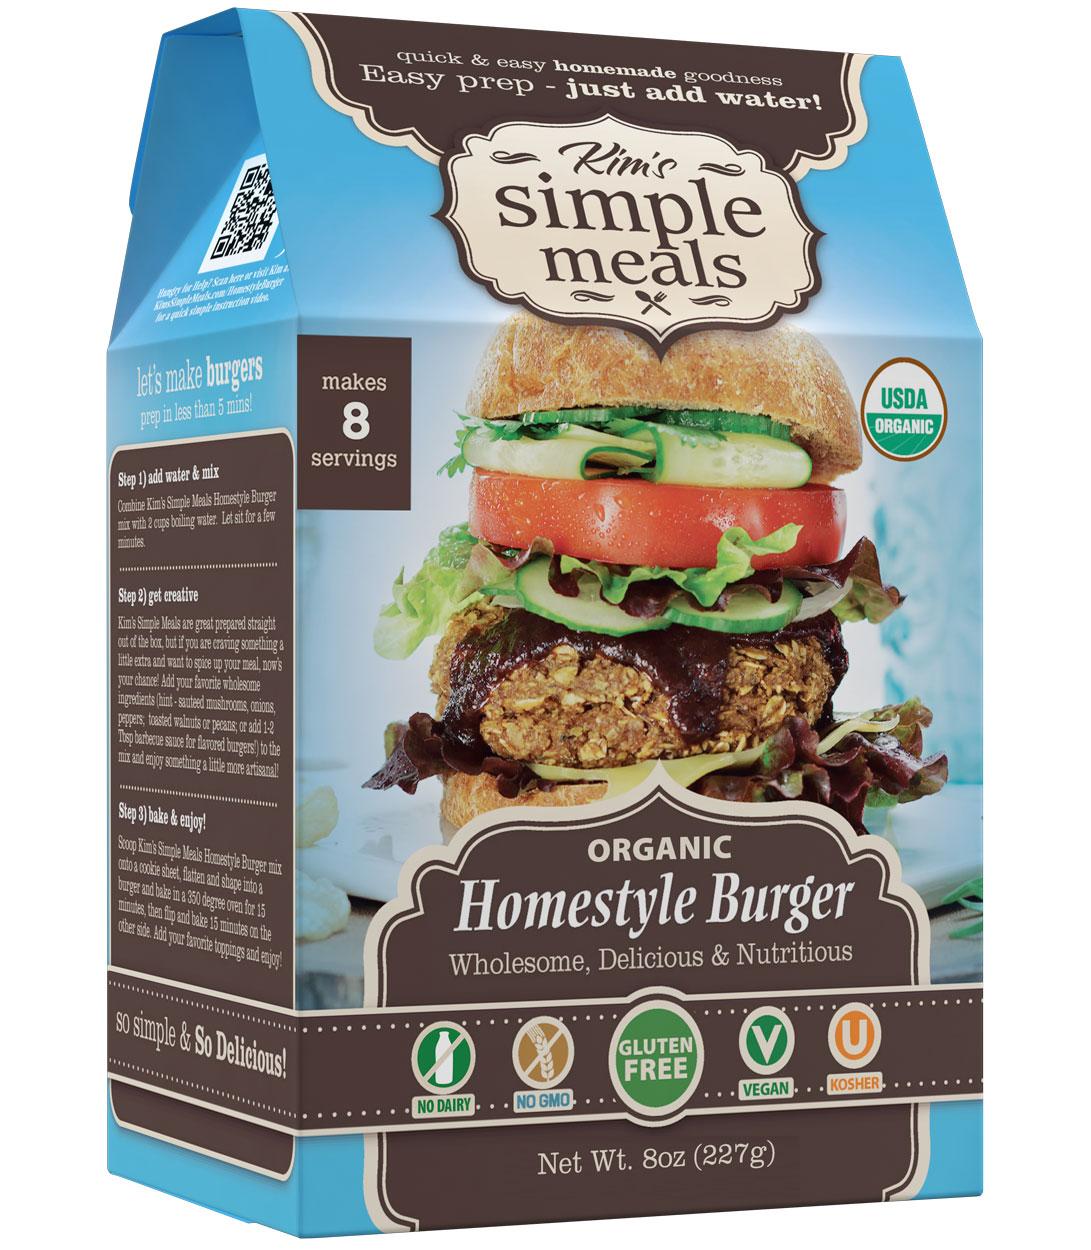 Homestyle-Burger